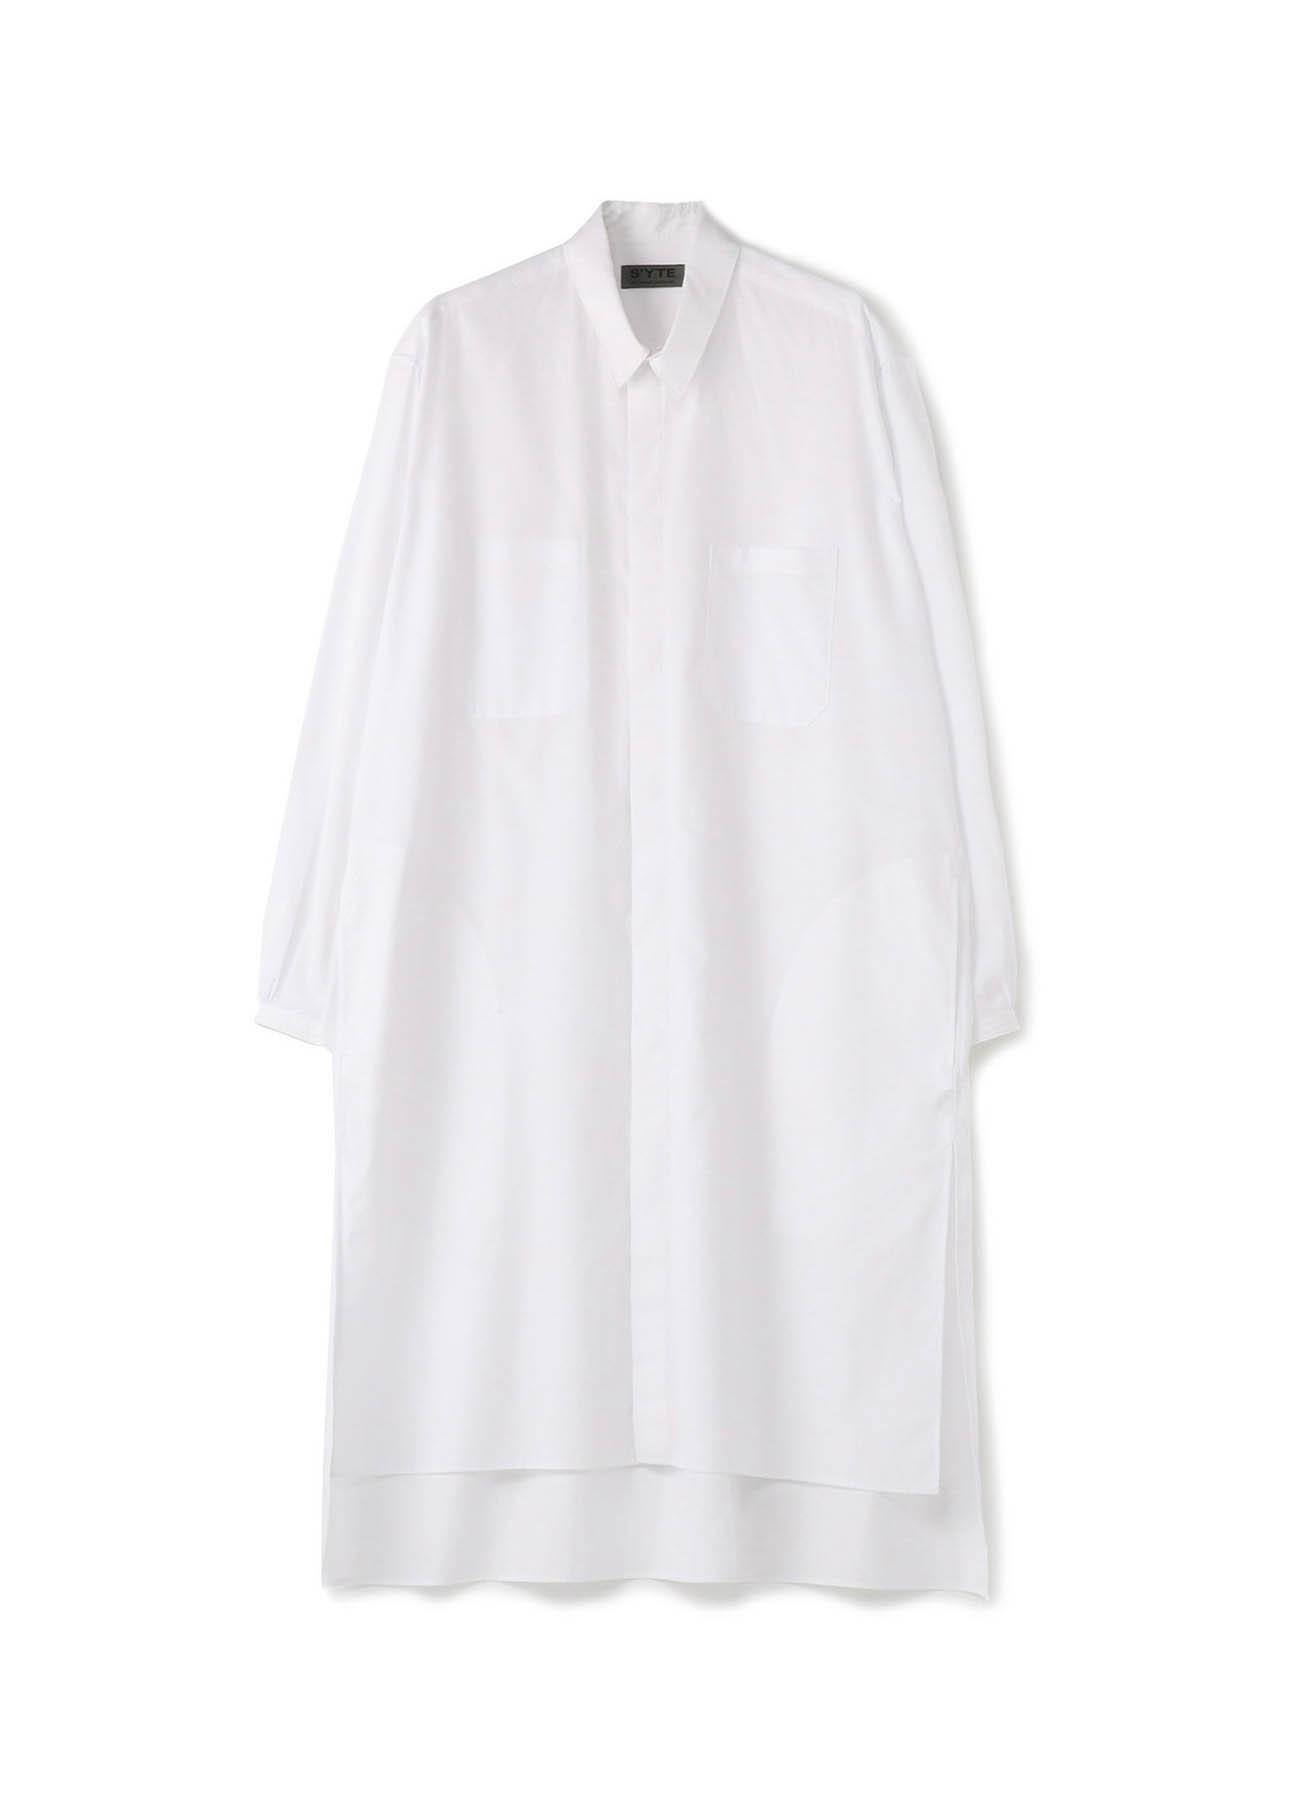 100/2 Broad Fly Front Big Coat Shirt